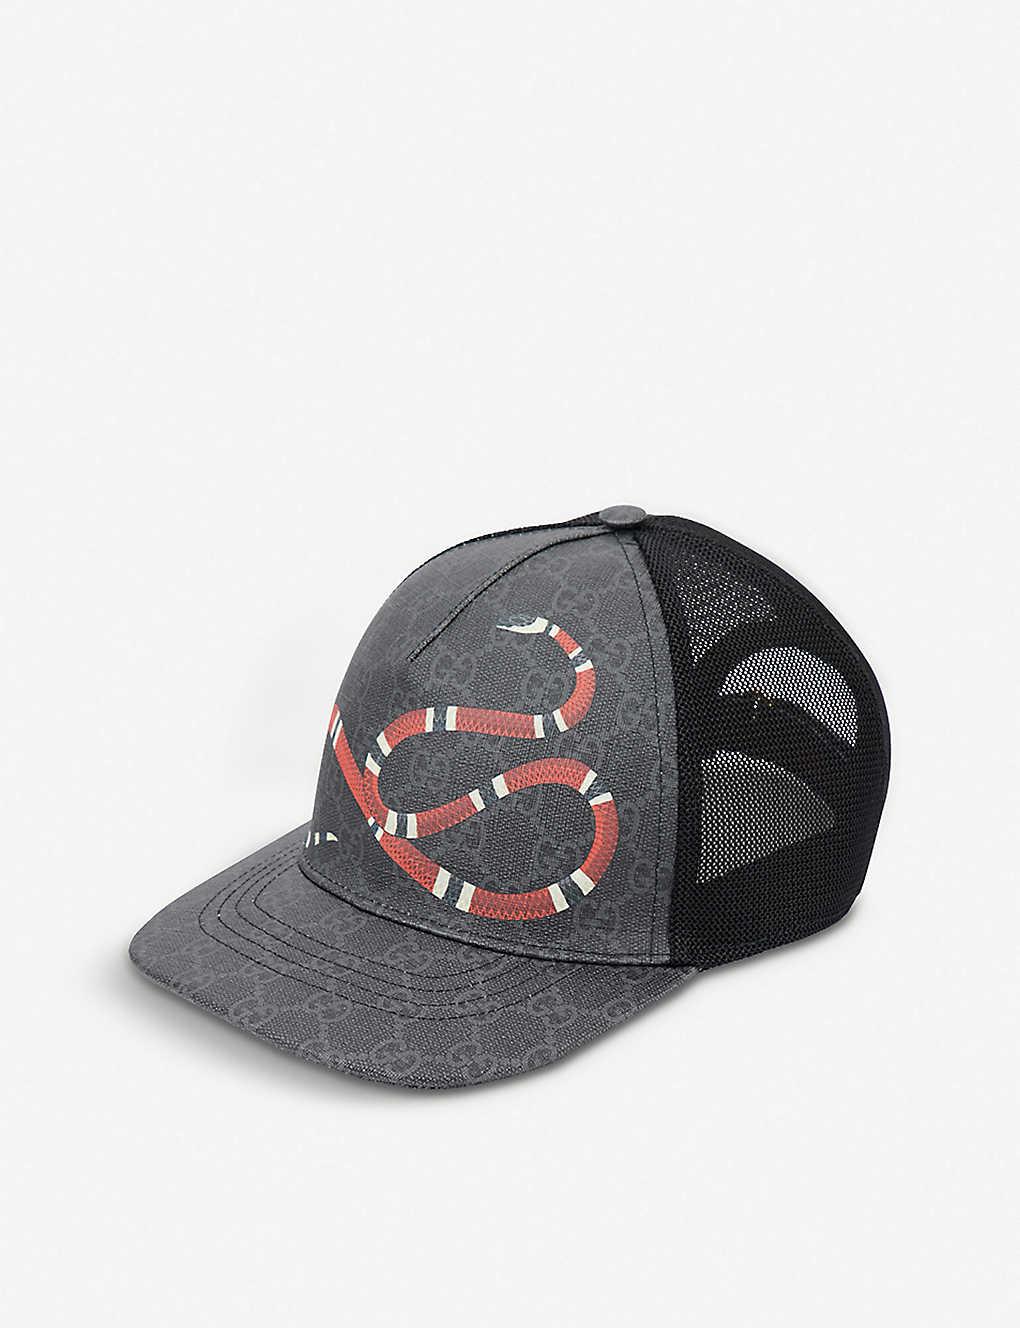 GUCCI - Kingsnake GG Supreme canvas and mesh baseball cap ... 62c51ecac307